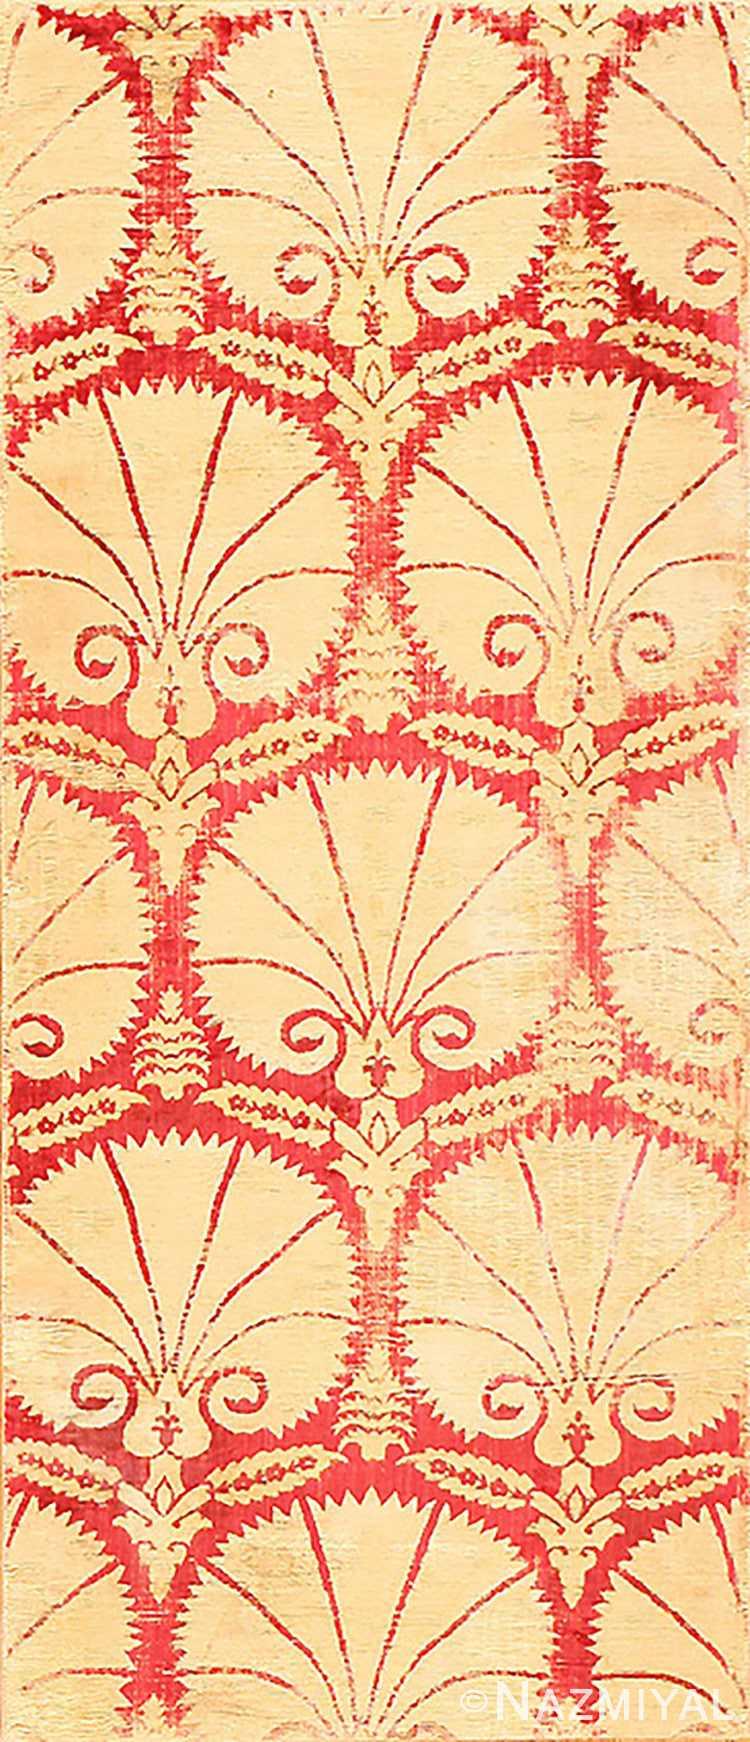 Floral Antique Turkish Ottoman Textile 48640 Nazmiyal